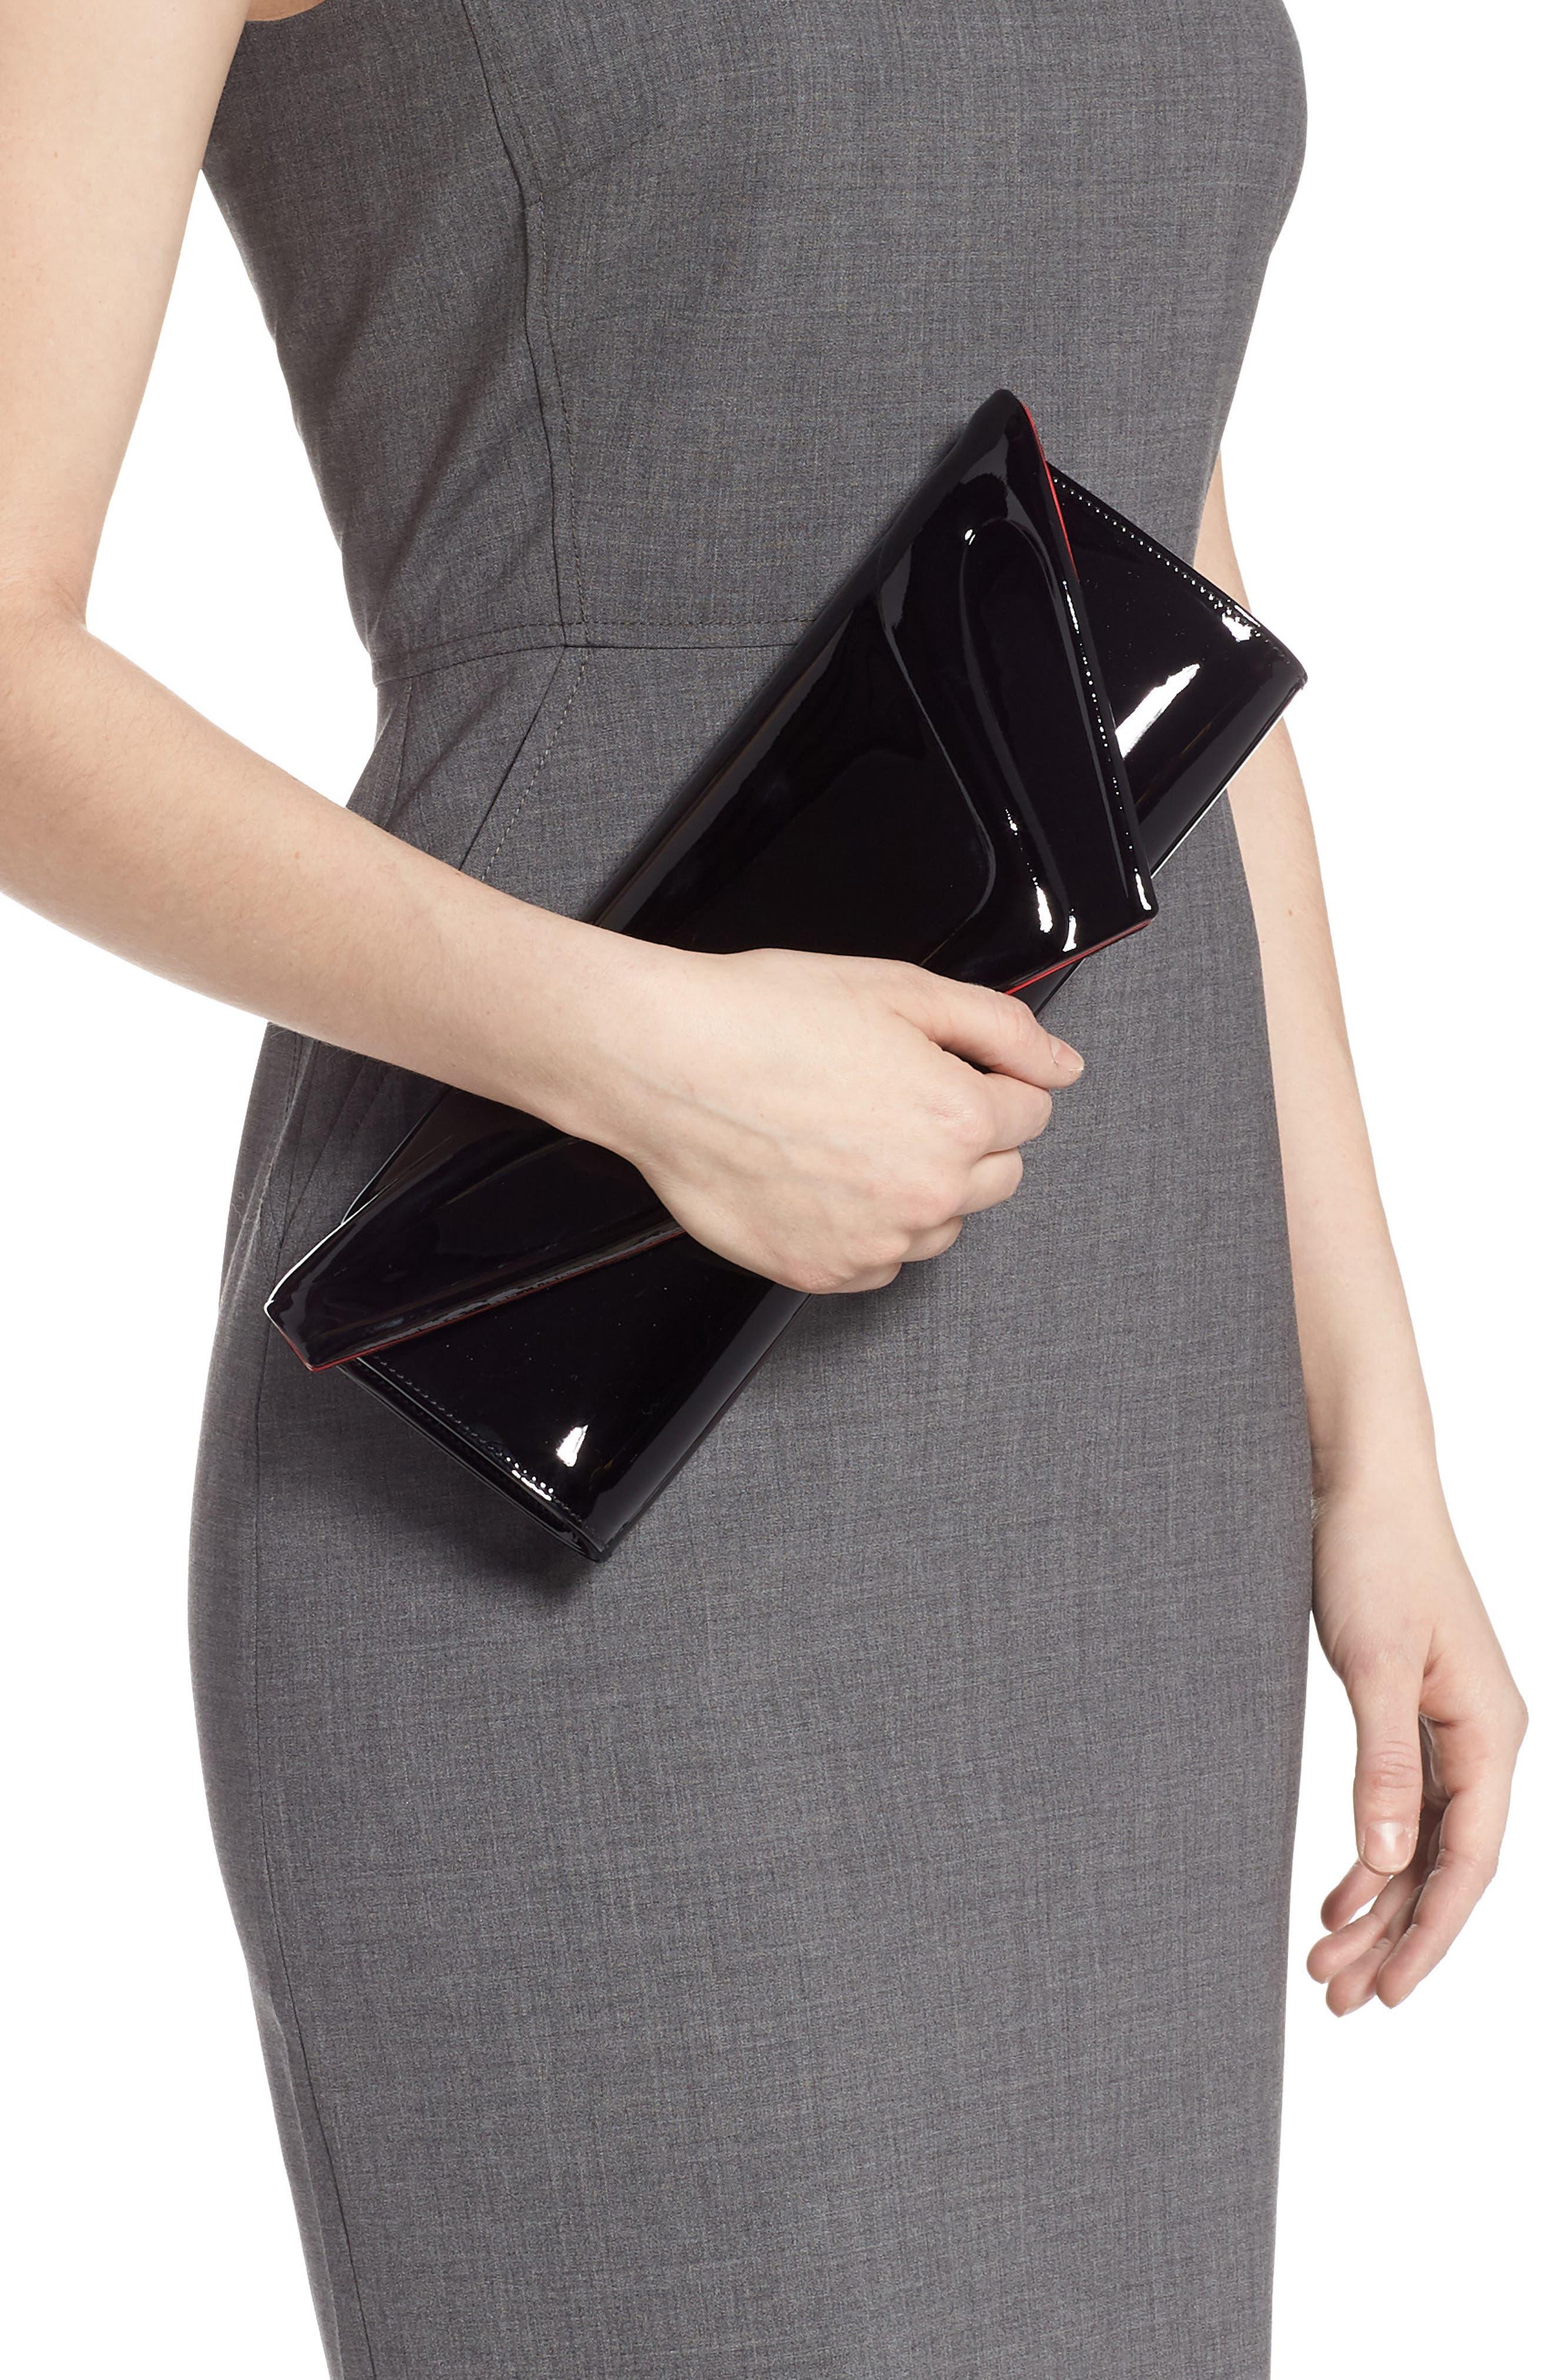 CHRISTIAN LOUBOUTIN, So Kate Patent Leather Clutch, Alternate thumbnail 2, color, BLACK